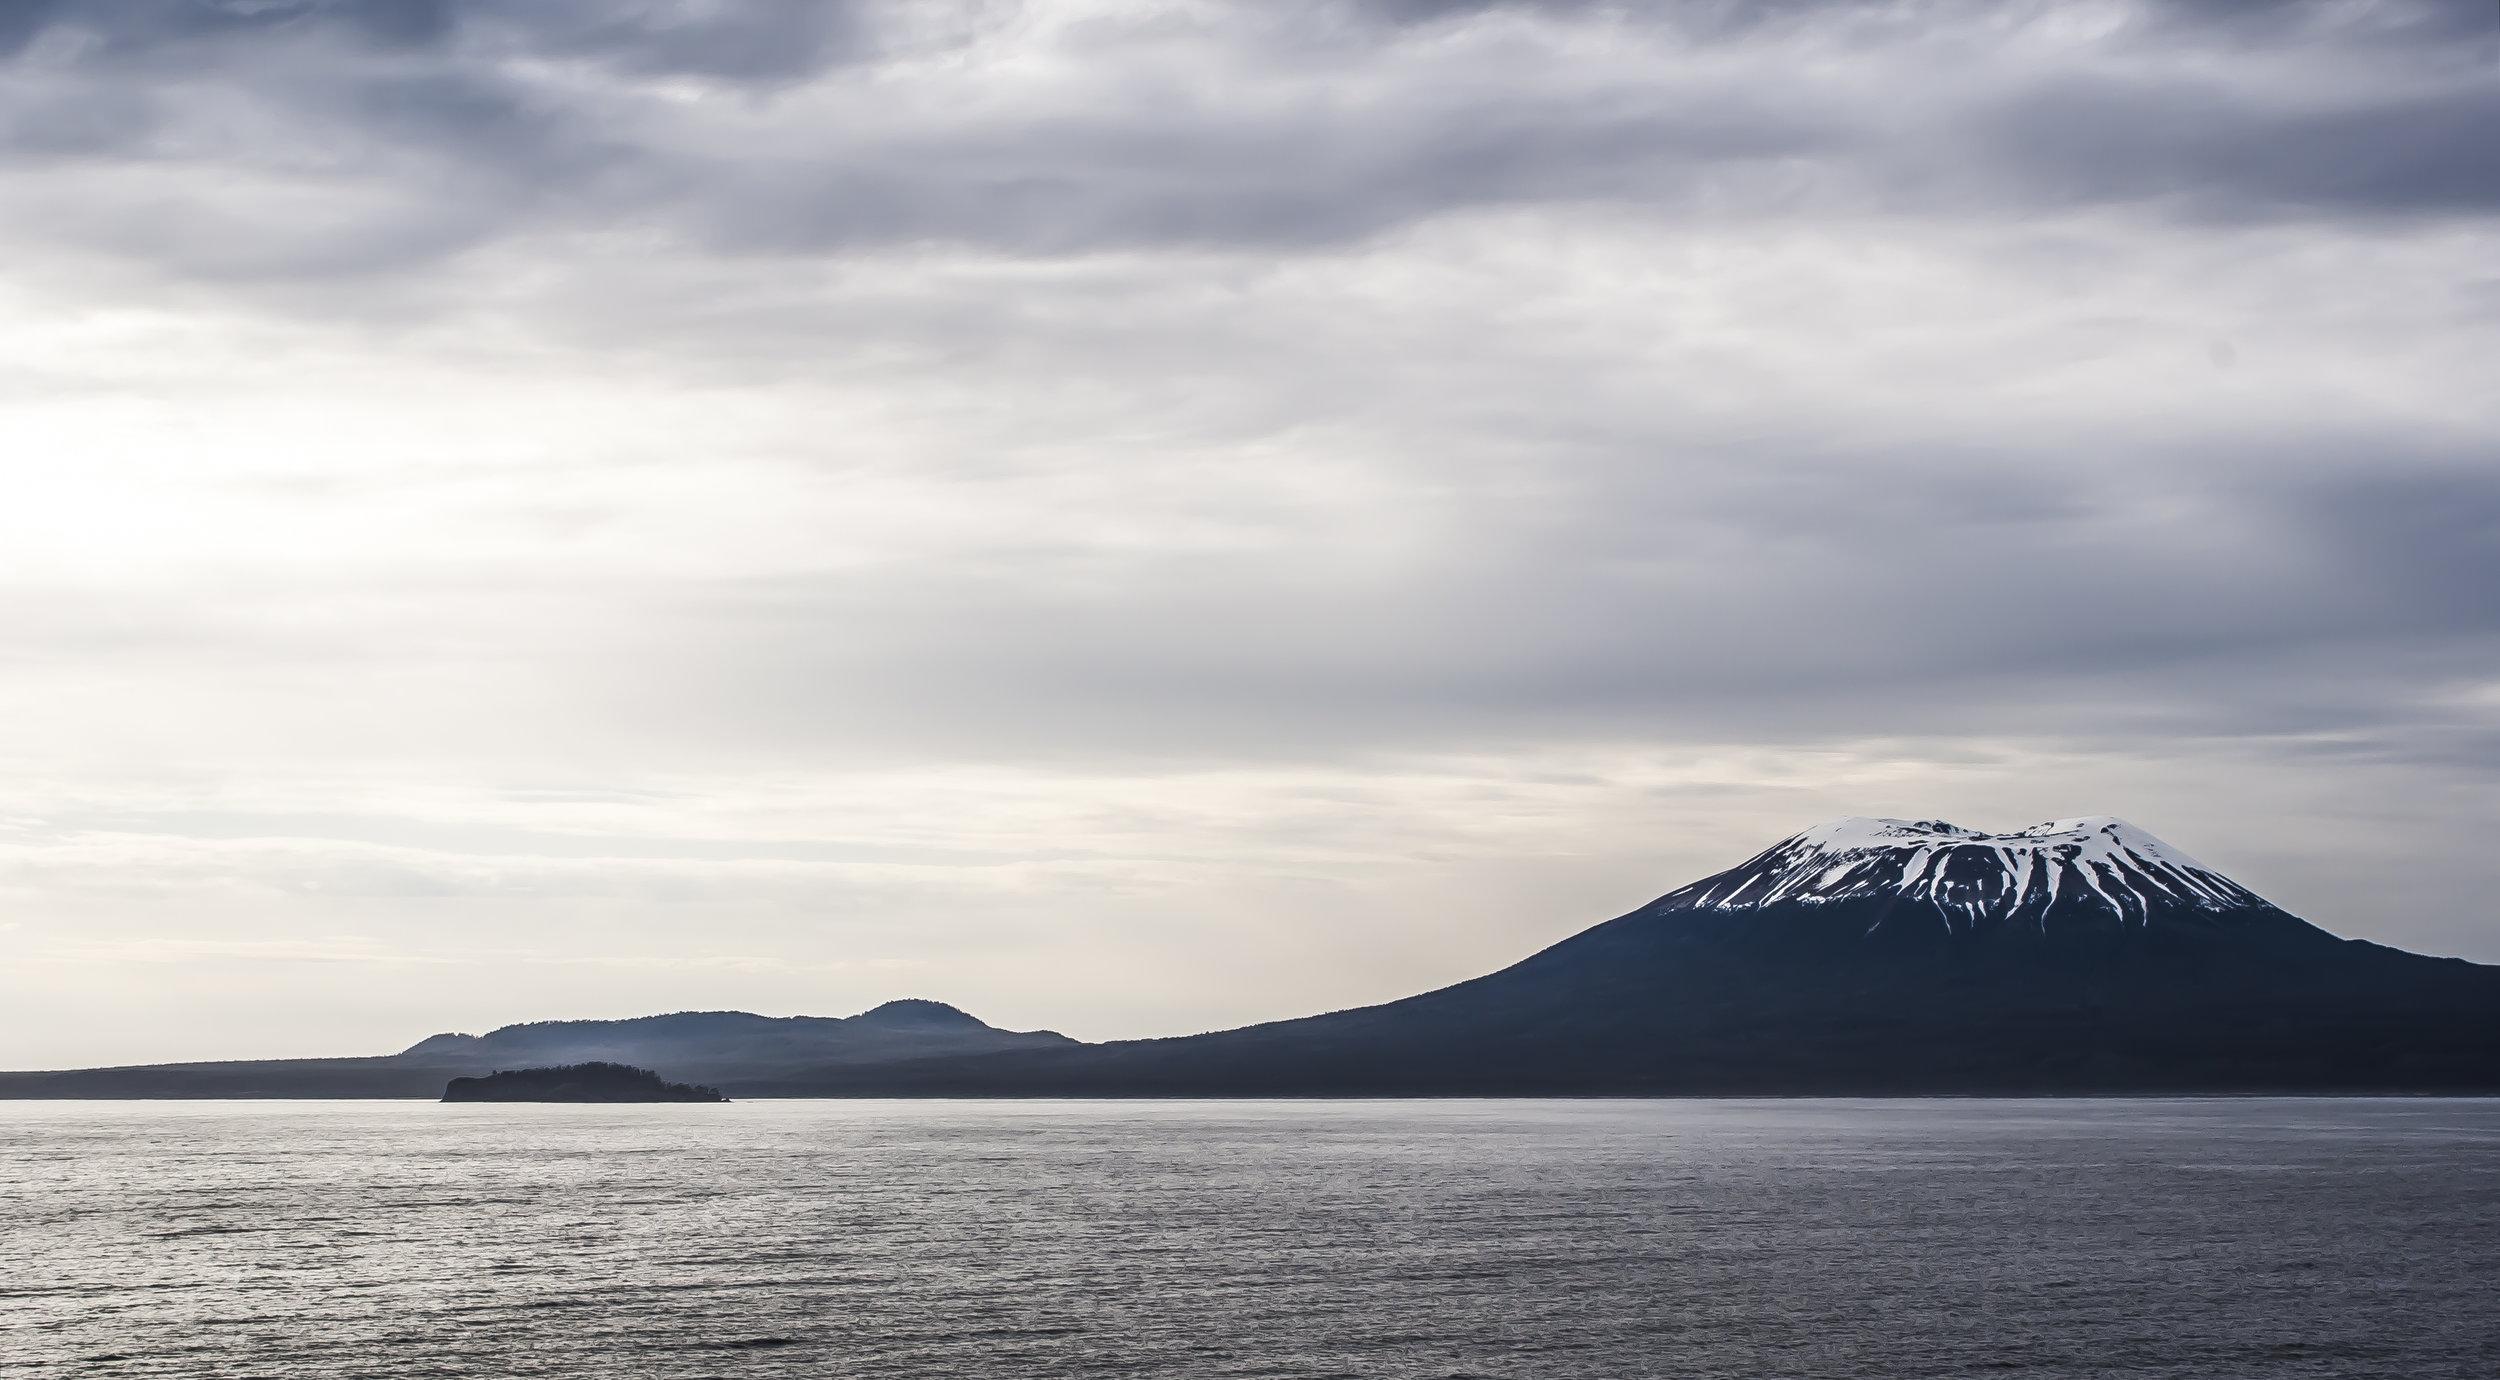 Mount Edgecumbe in Sitka, Alaska